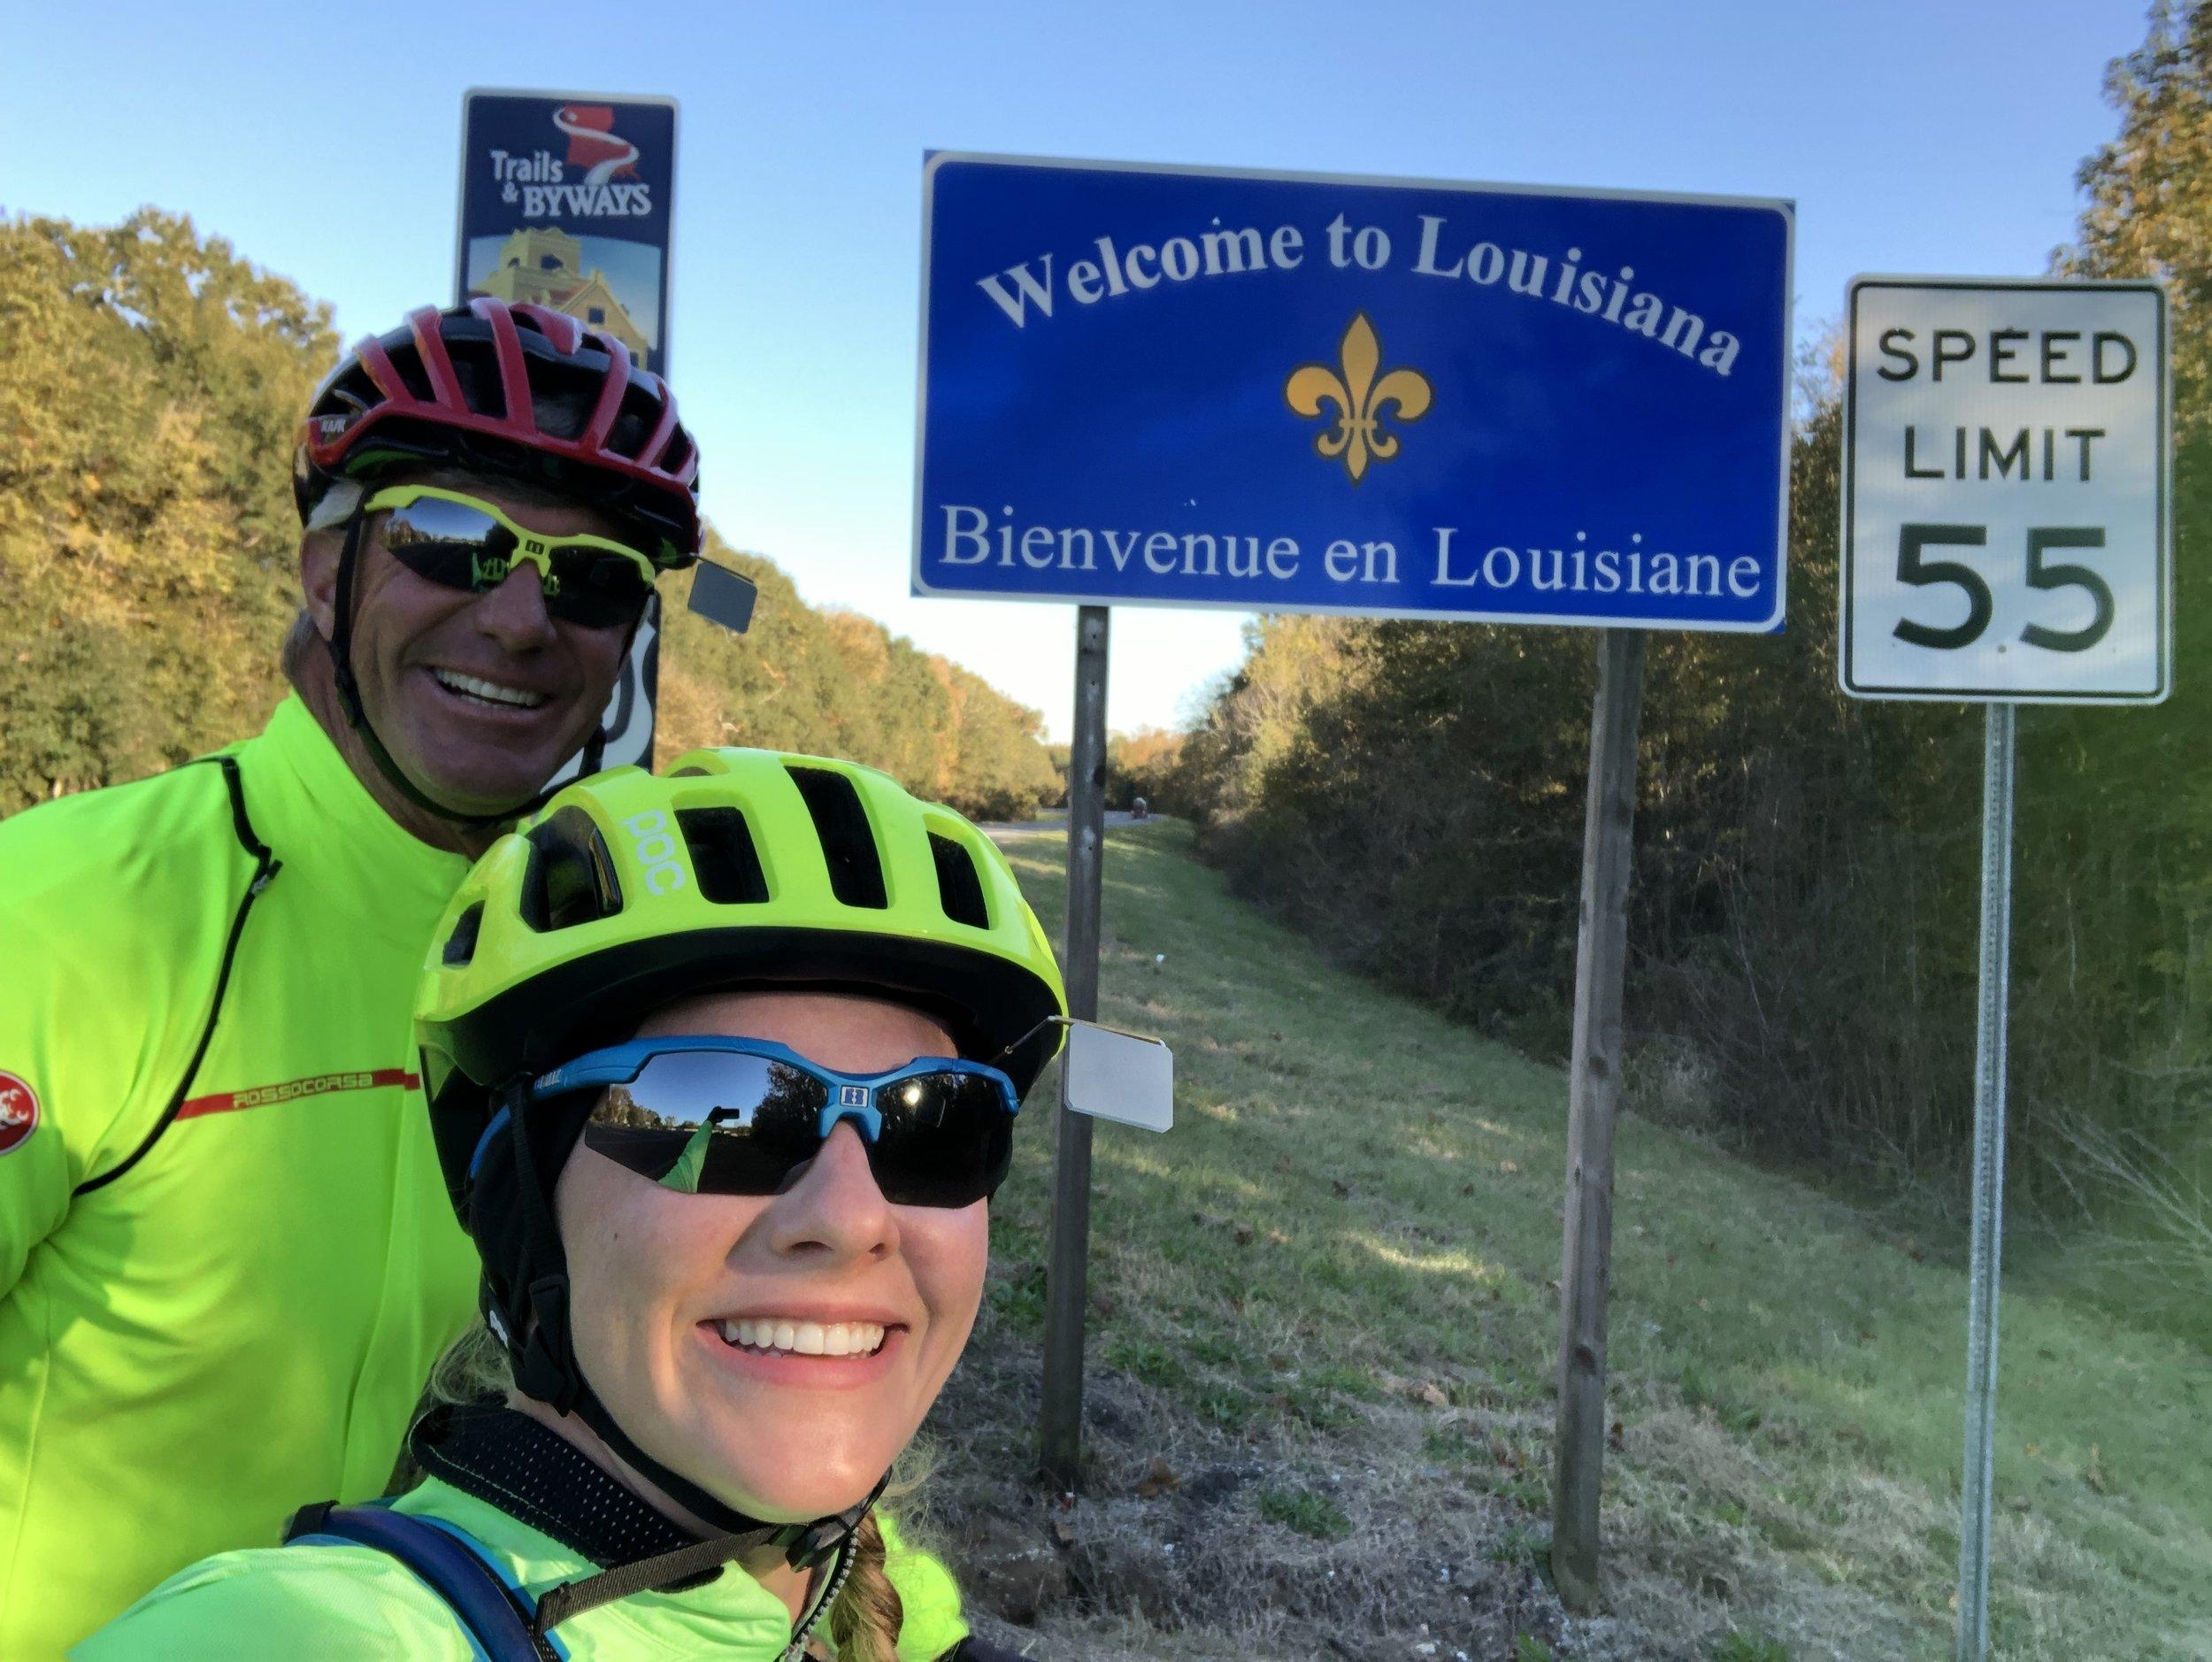 Welcome to Louisiana!